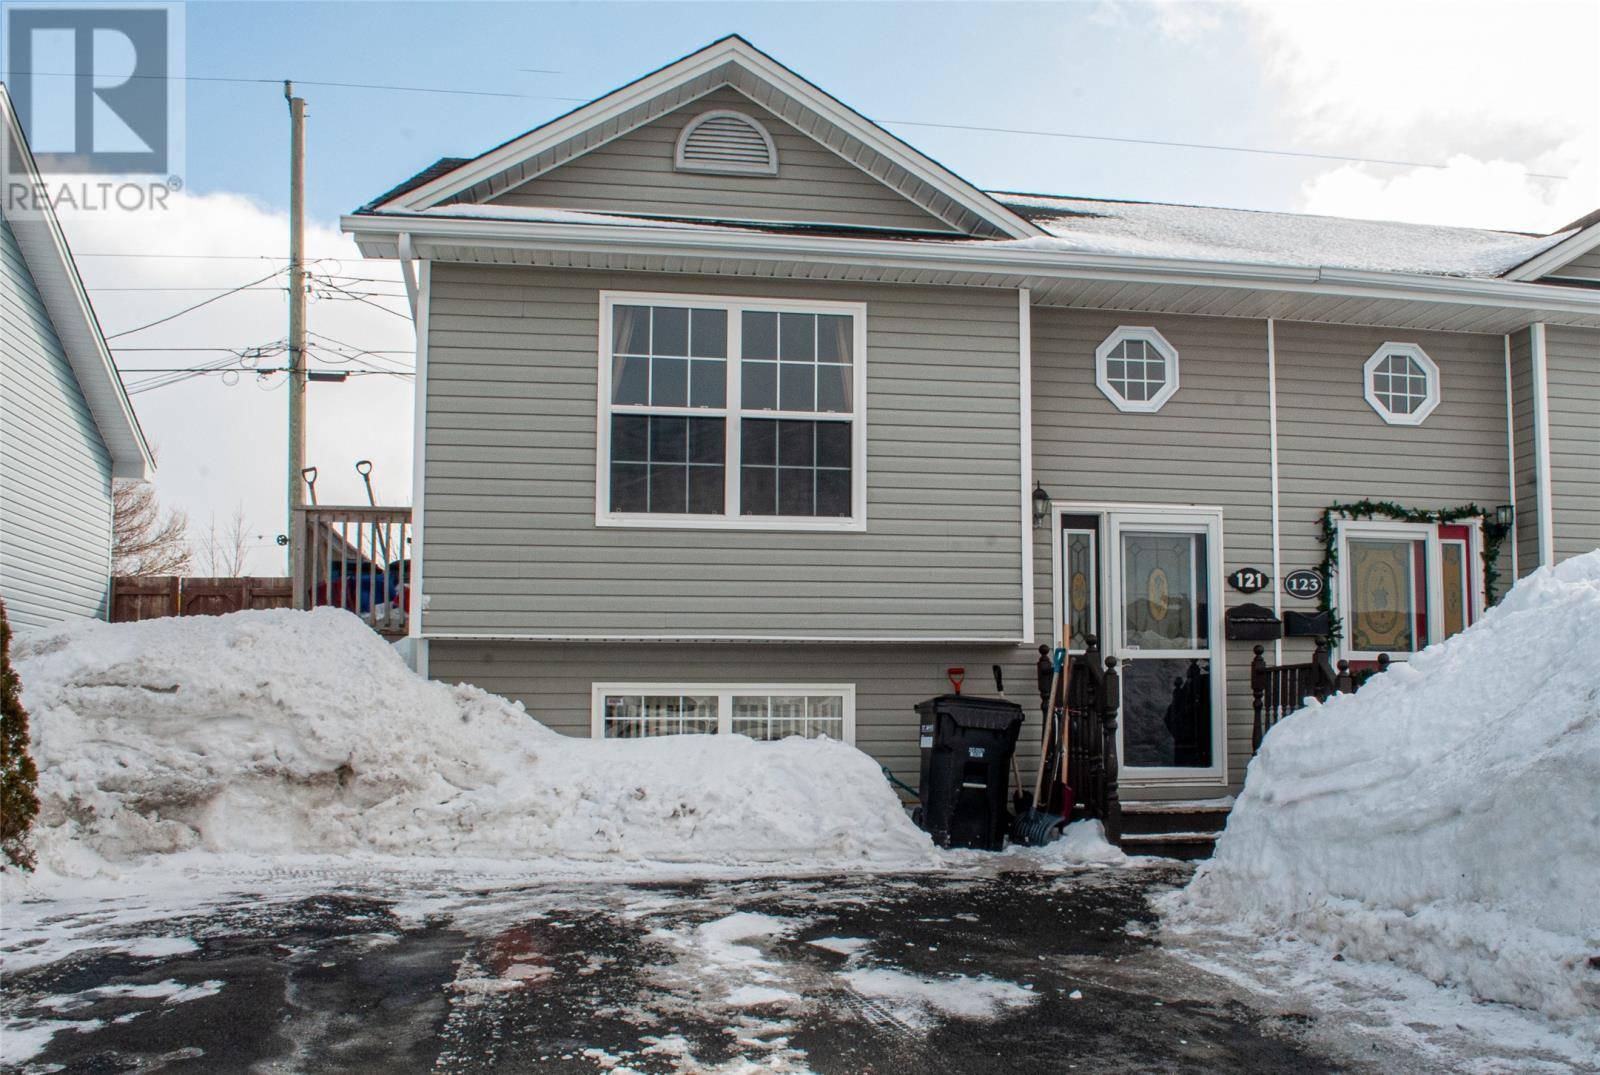 House for sale at 121 Edison Pl St. John's Newfoundland - MLS: 1211535